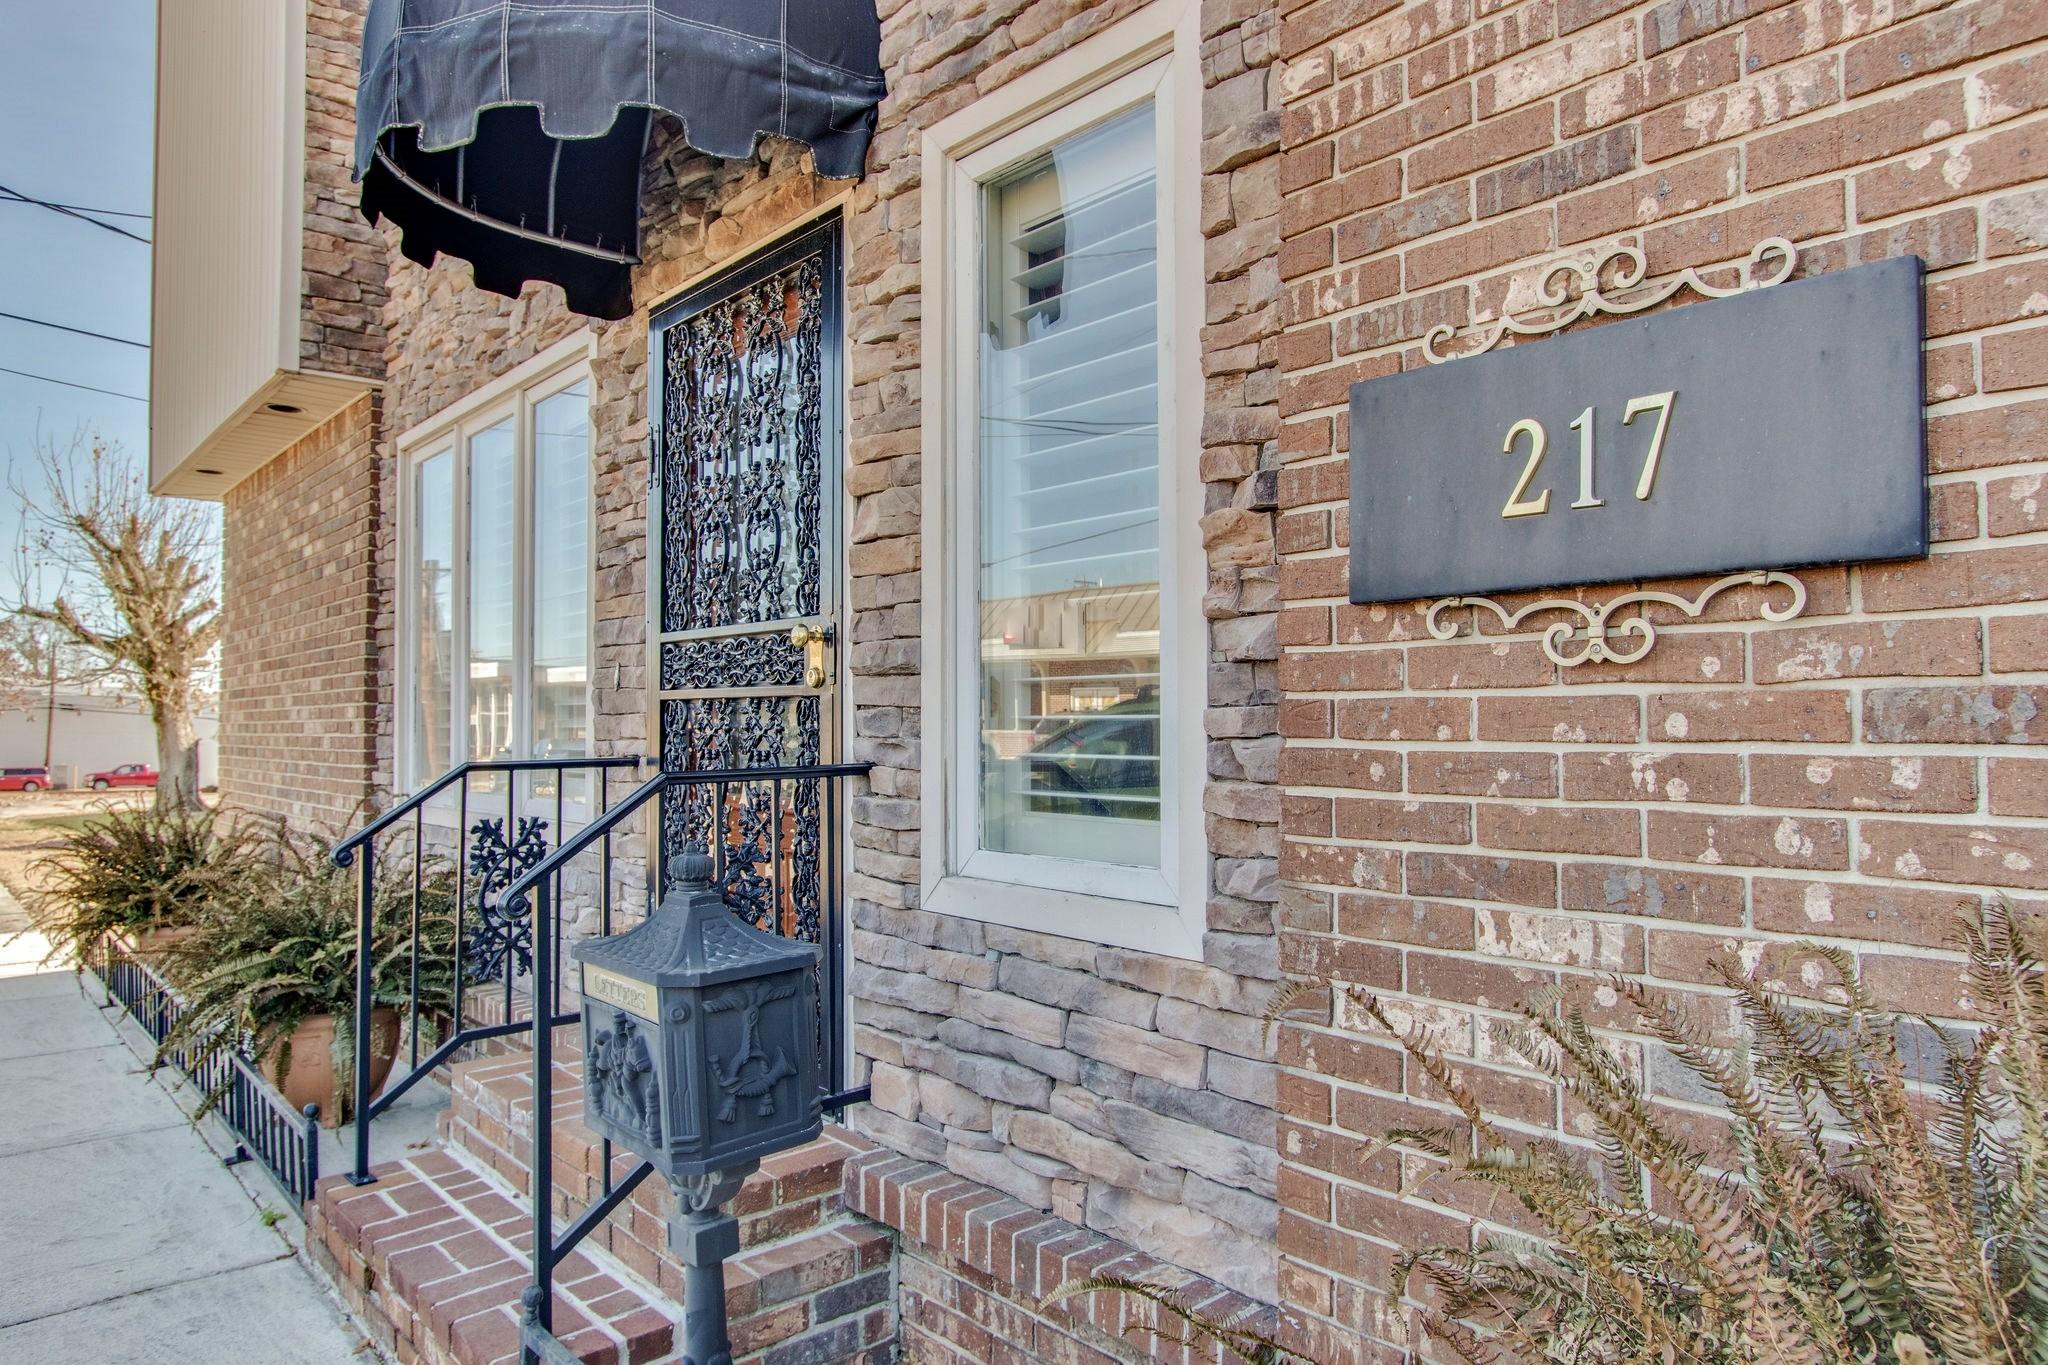 217 W Main St, Smithville, TN 37166 - Smithville, TN real estate listing